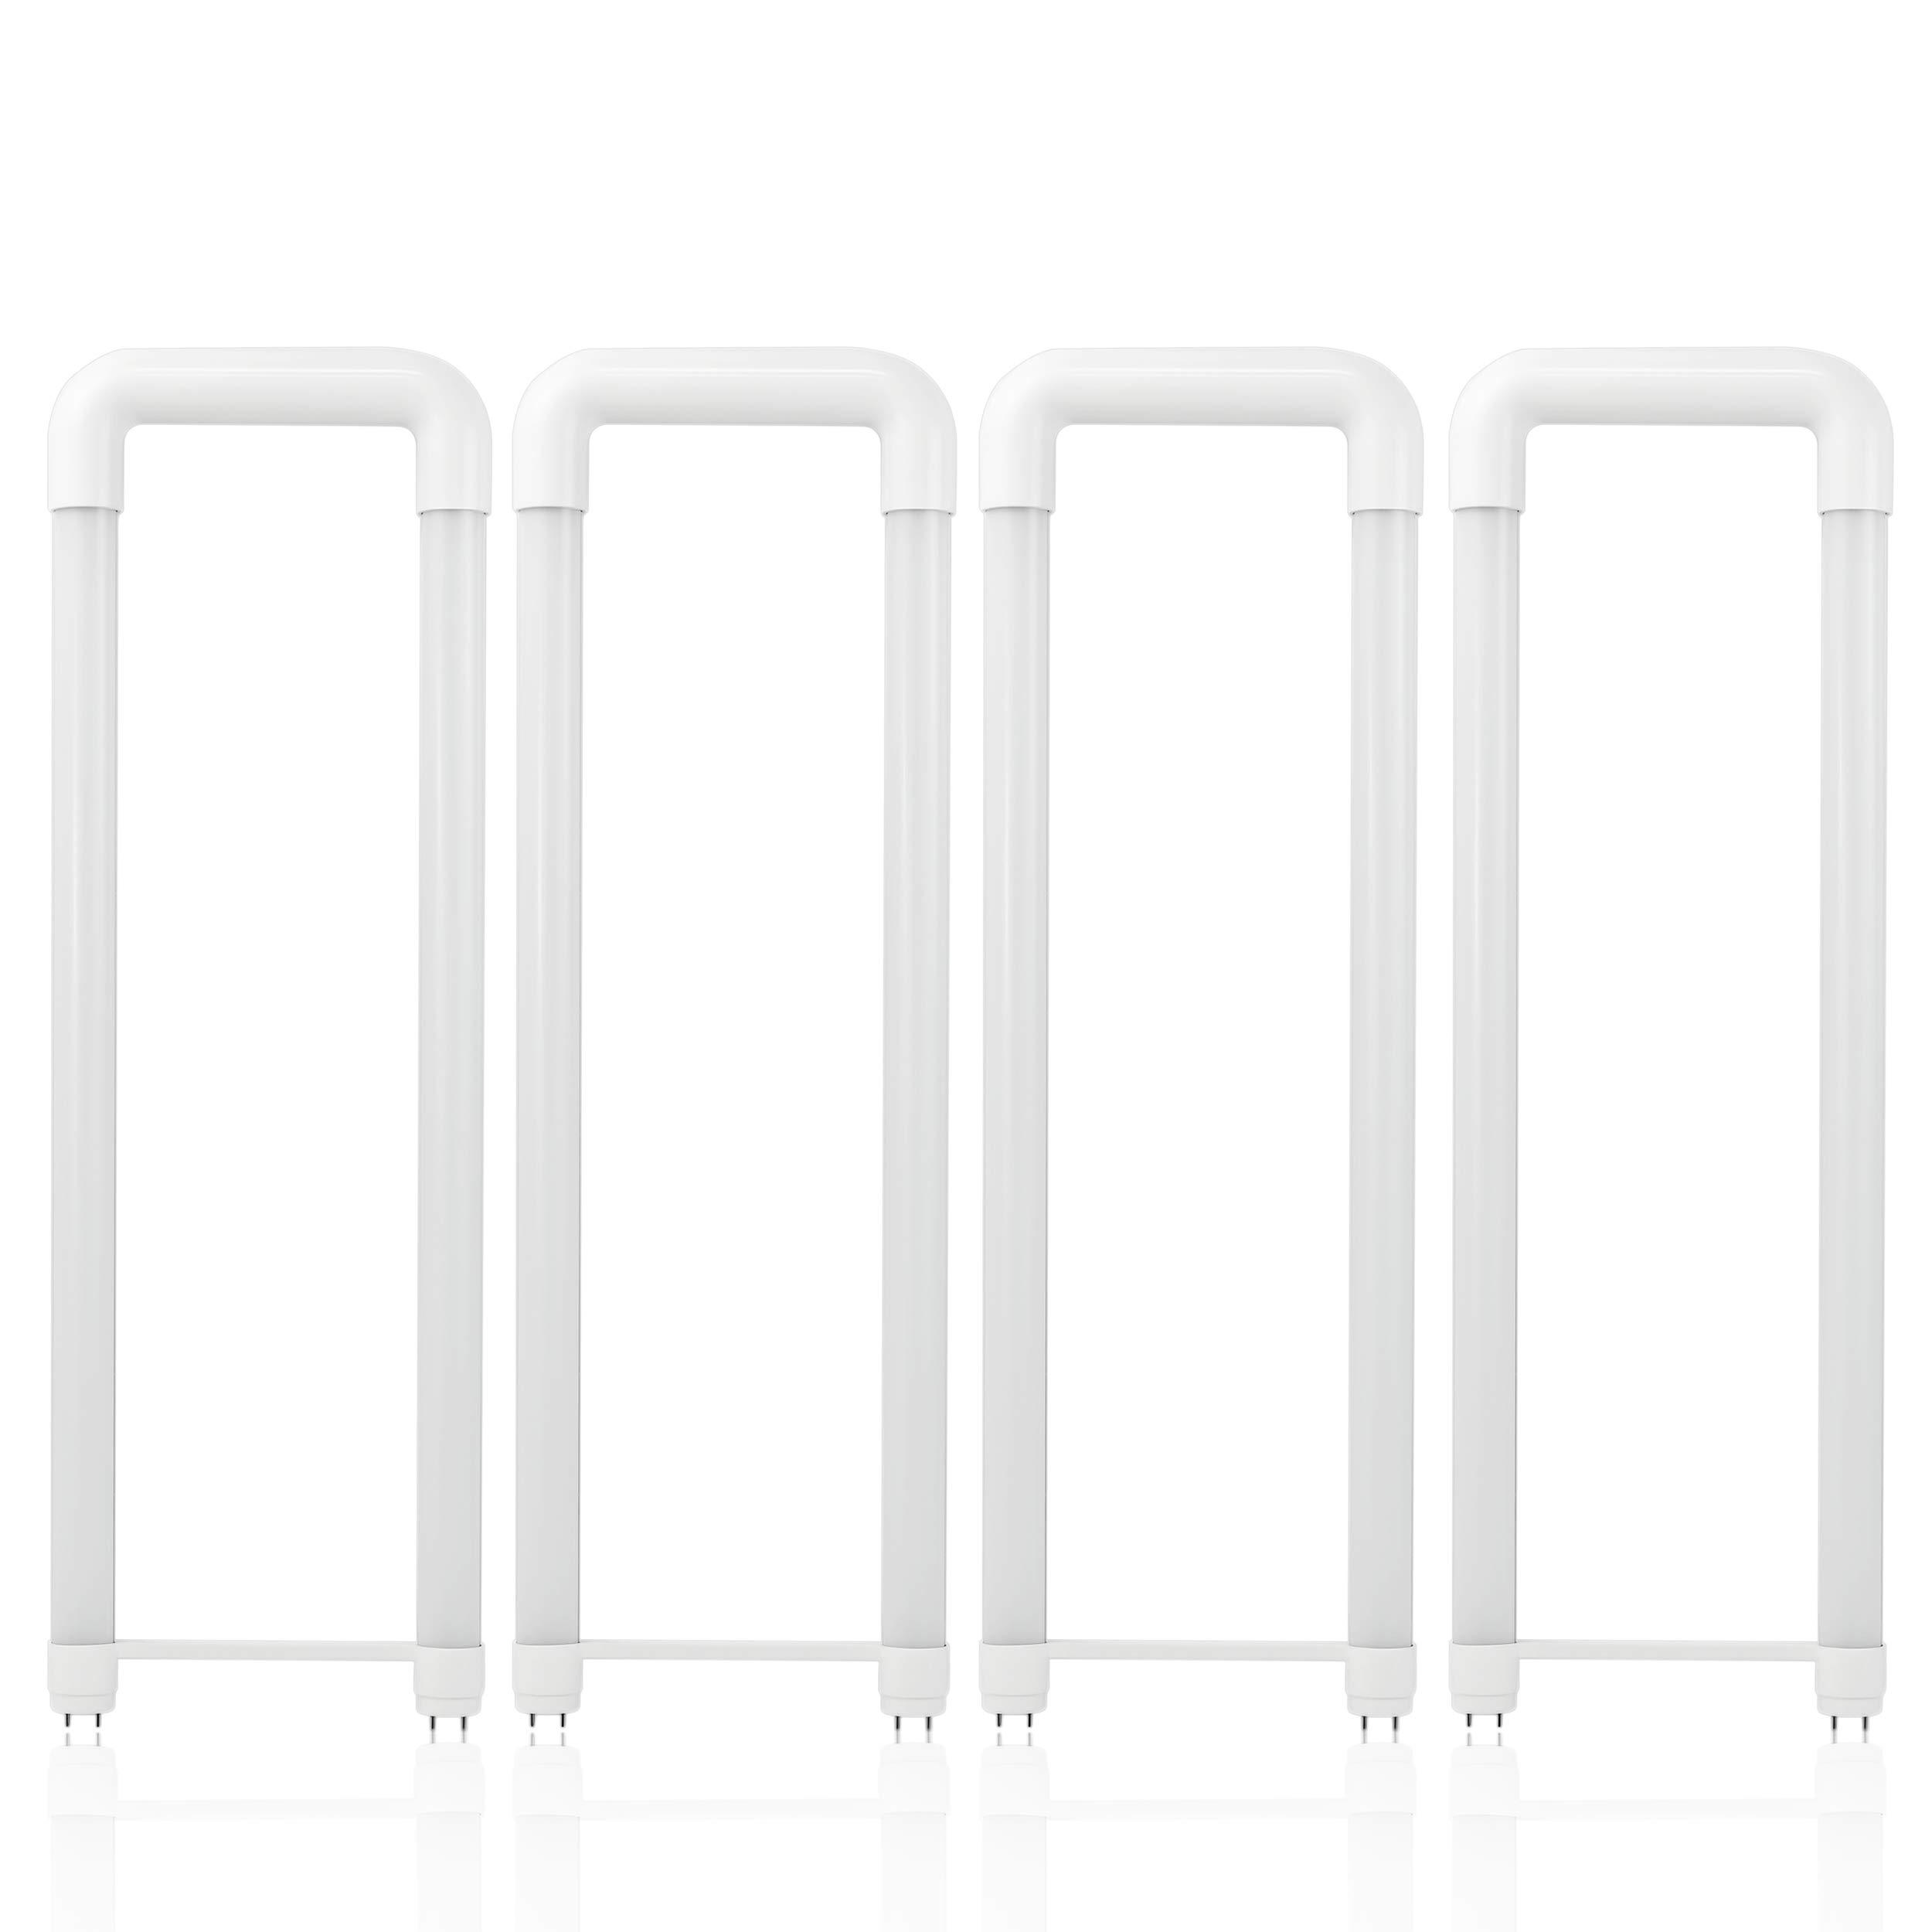 Hyperikon U Bent LED Tube, 2x2 Foot, 40 Watt (18W) Frosted, T8 T10 T12 Light Bulbs, 4000K Daylight, Shatterproof, 4 Pack